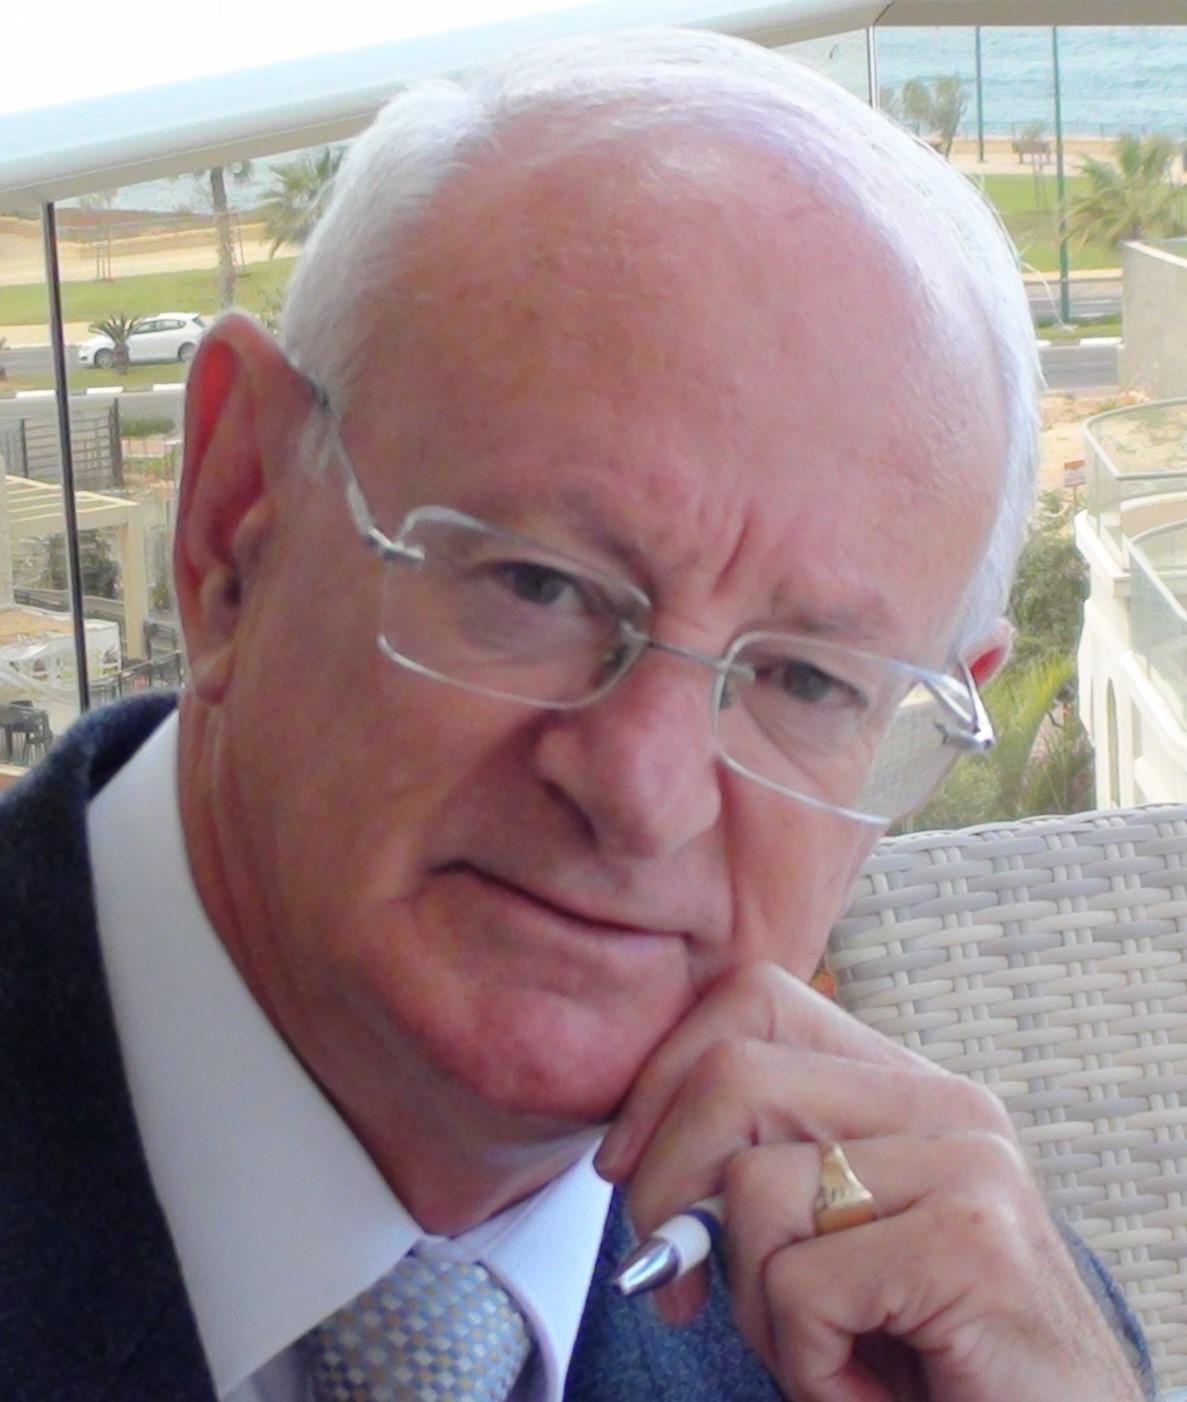 Israelis can reclaim their land at the ballot box